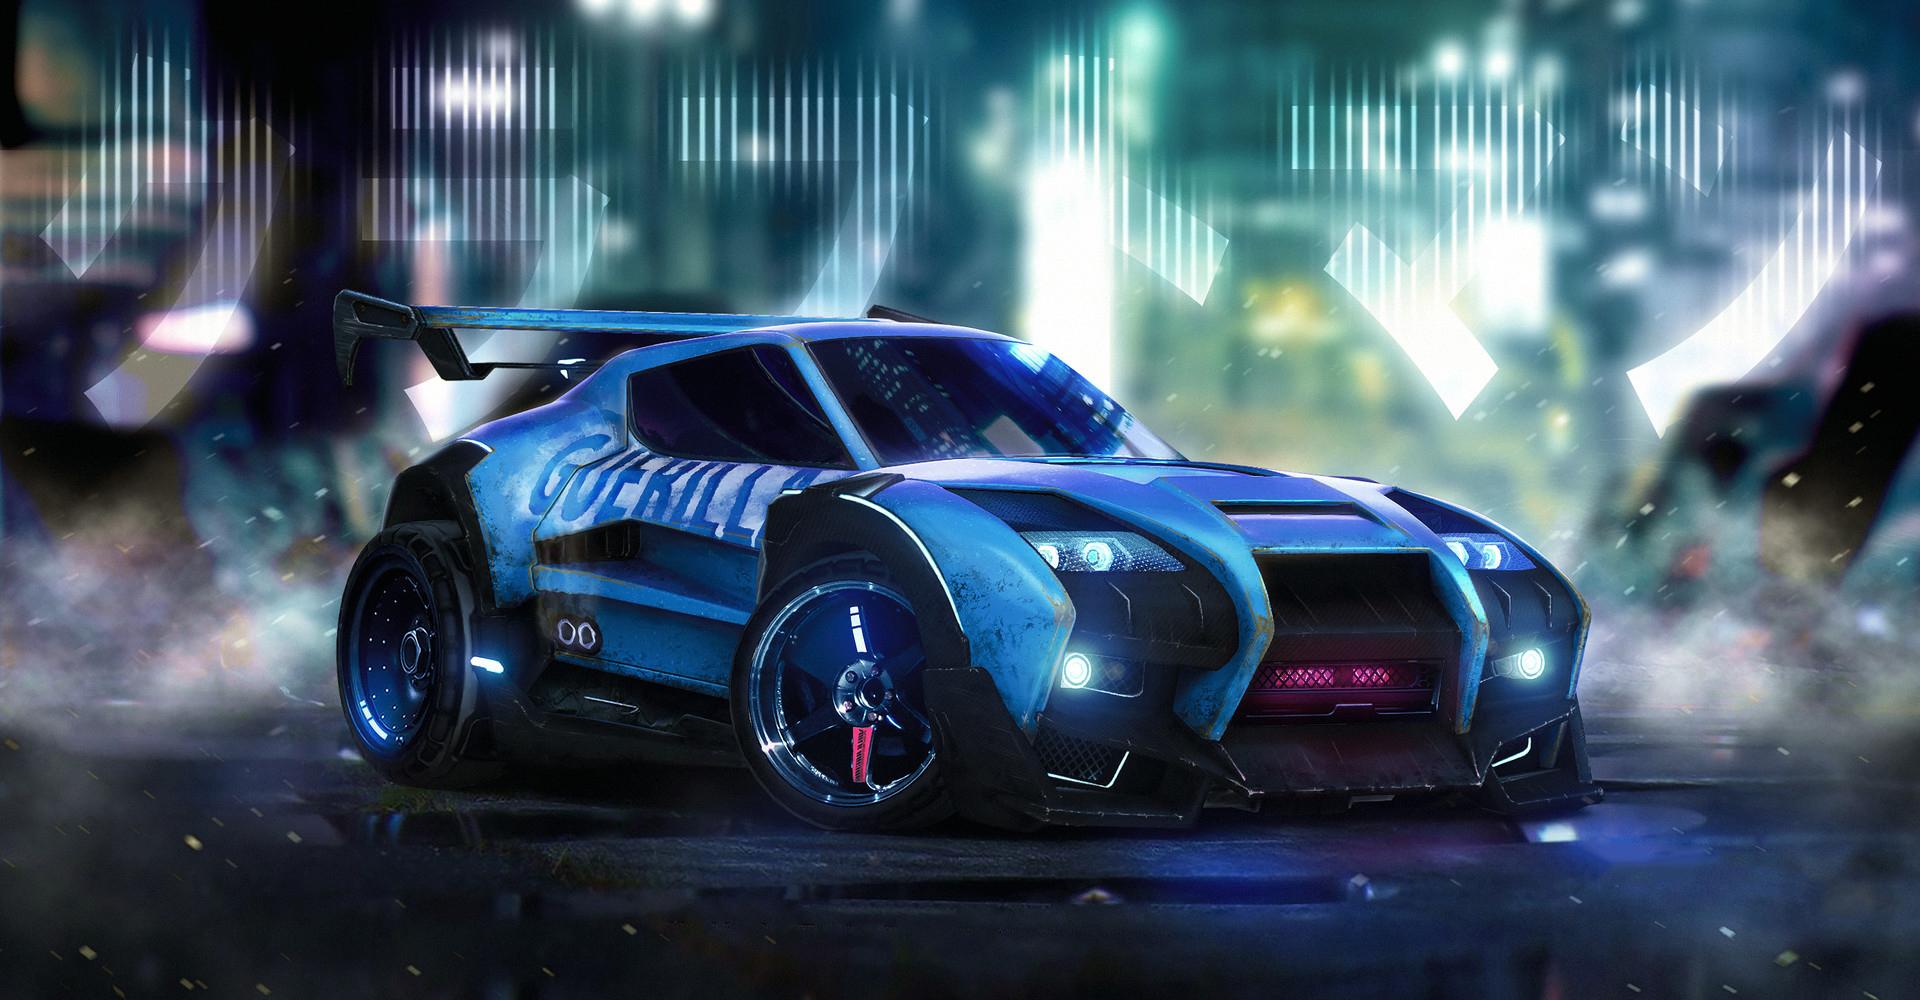 Rocket League Car Artwork, HD Games, 4k Wallpapers, Images